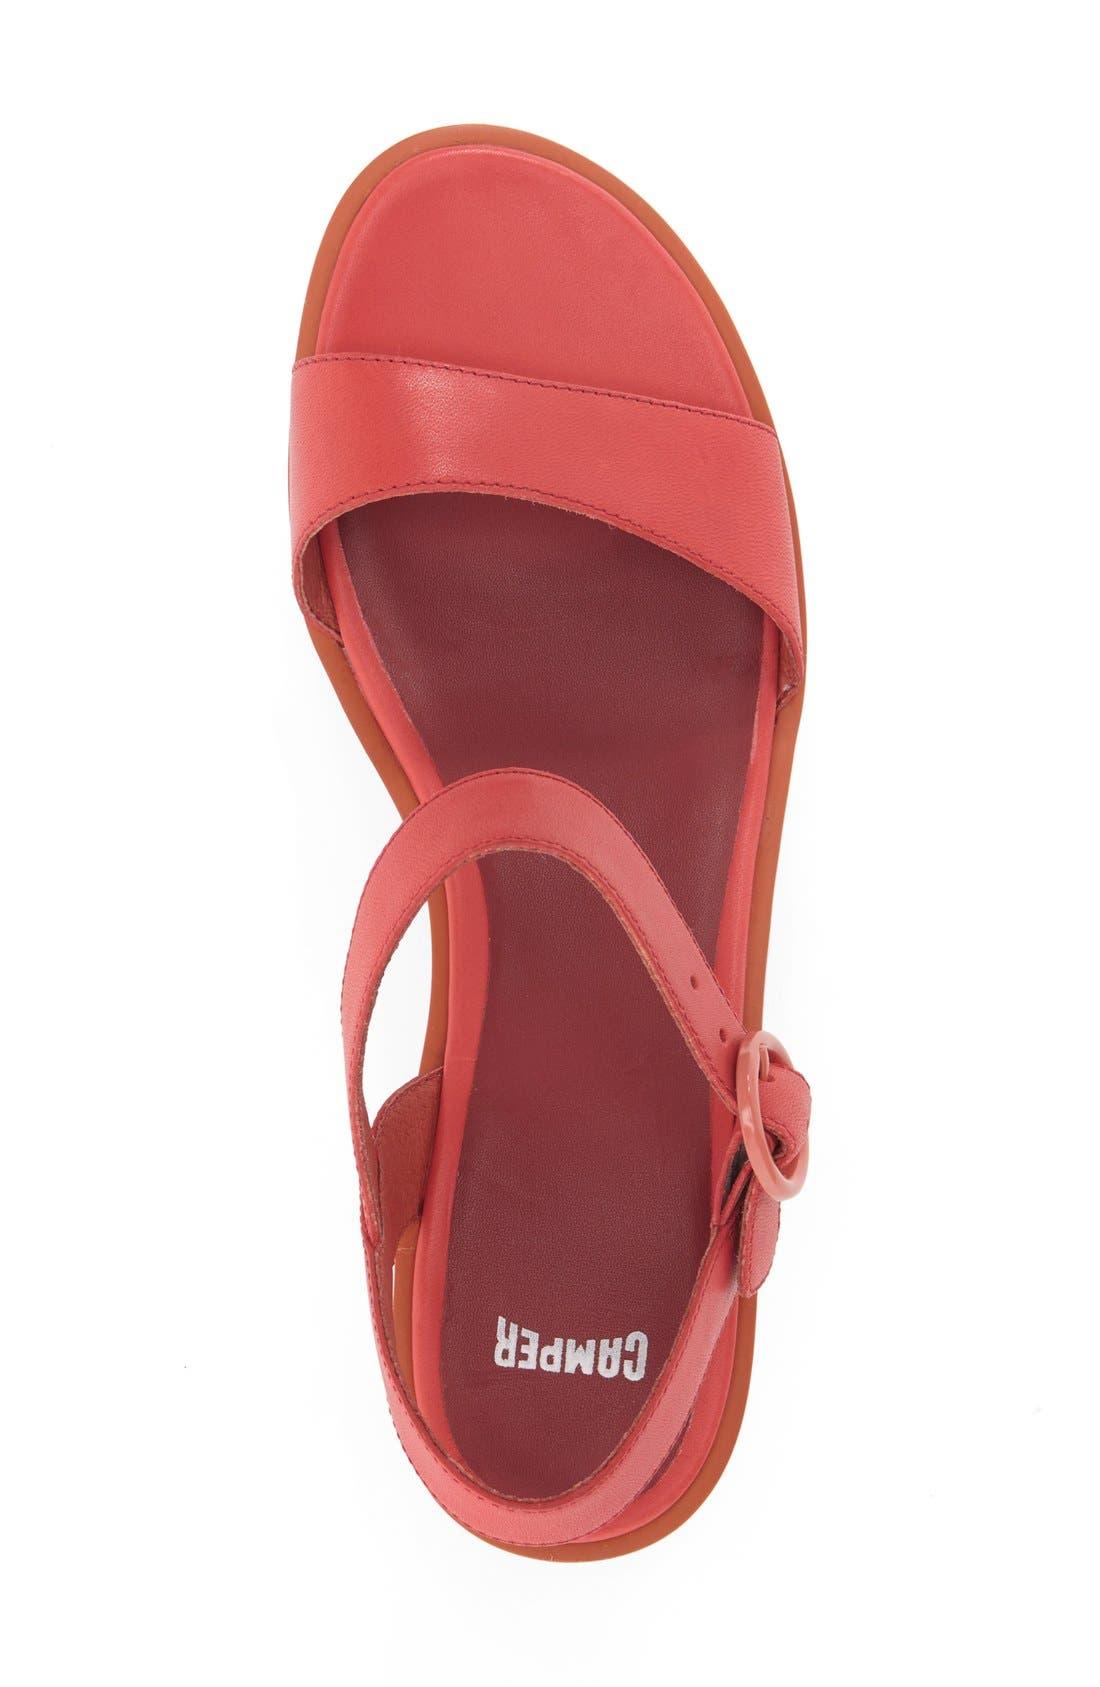 'Damas' Wedge Sandal,                             Alternate thumbnail 23, color,